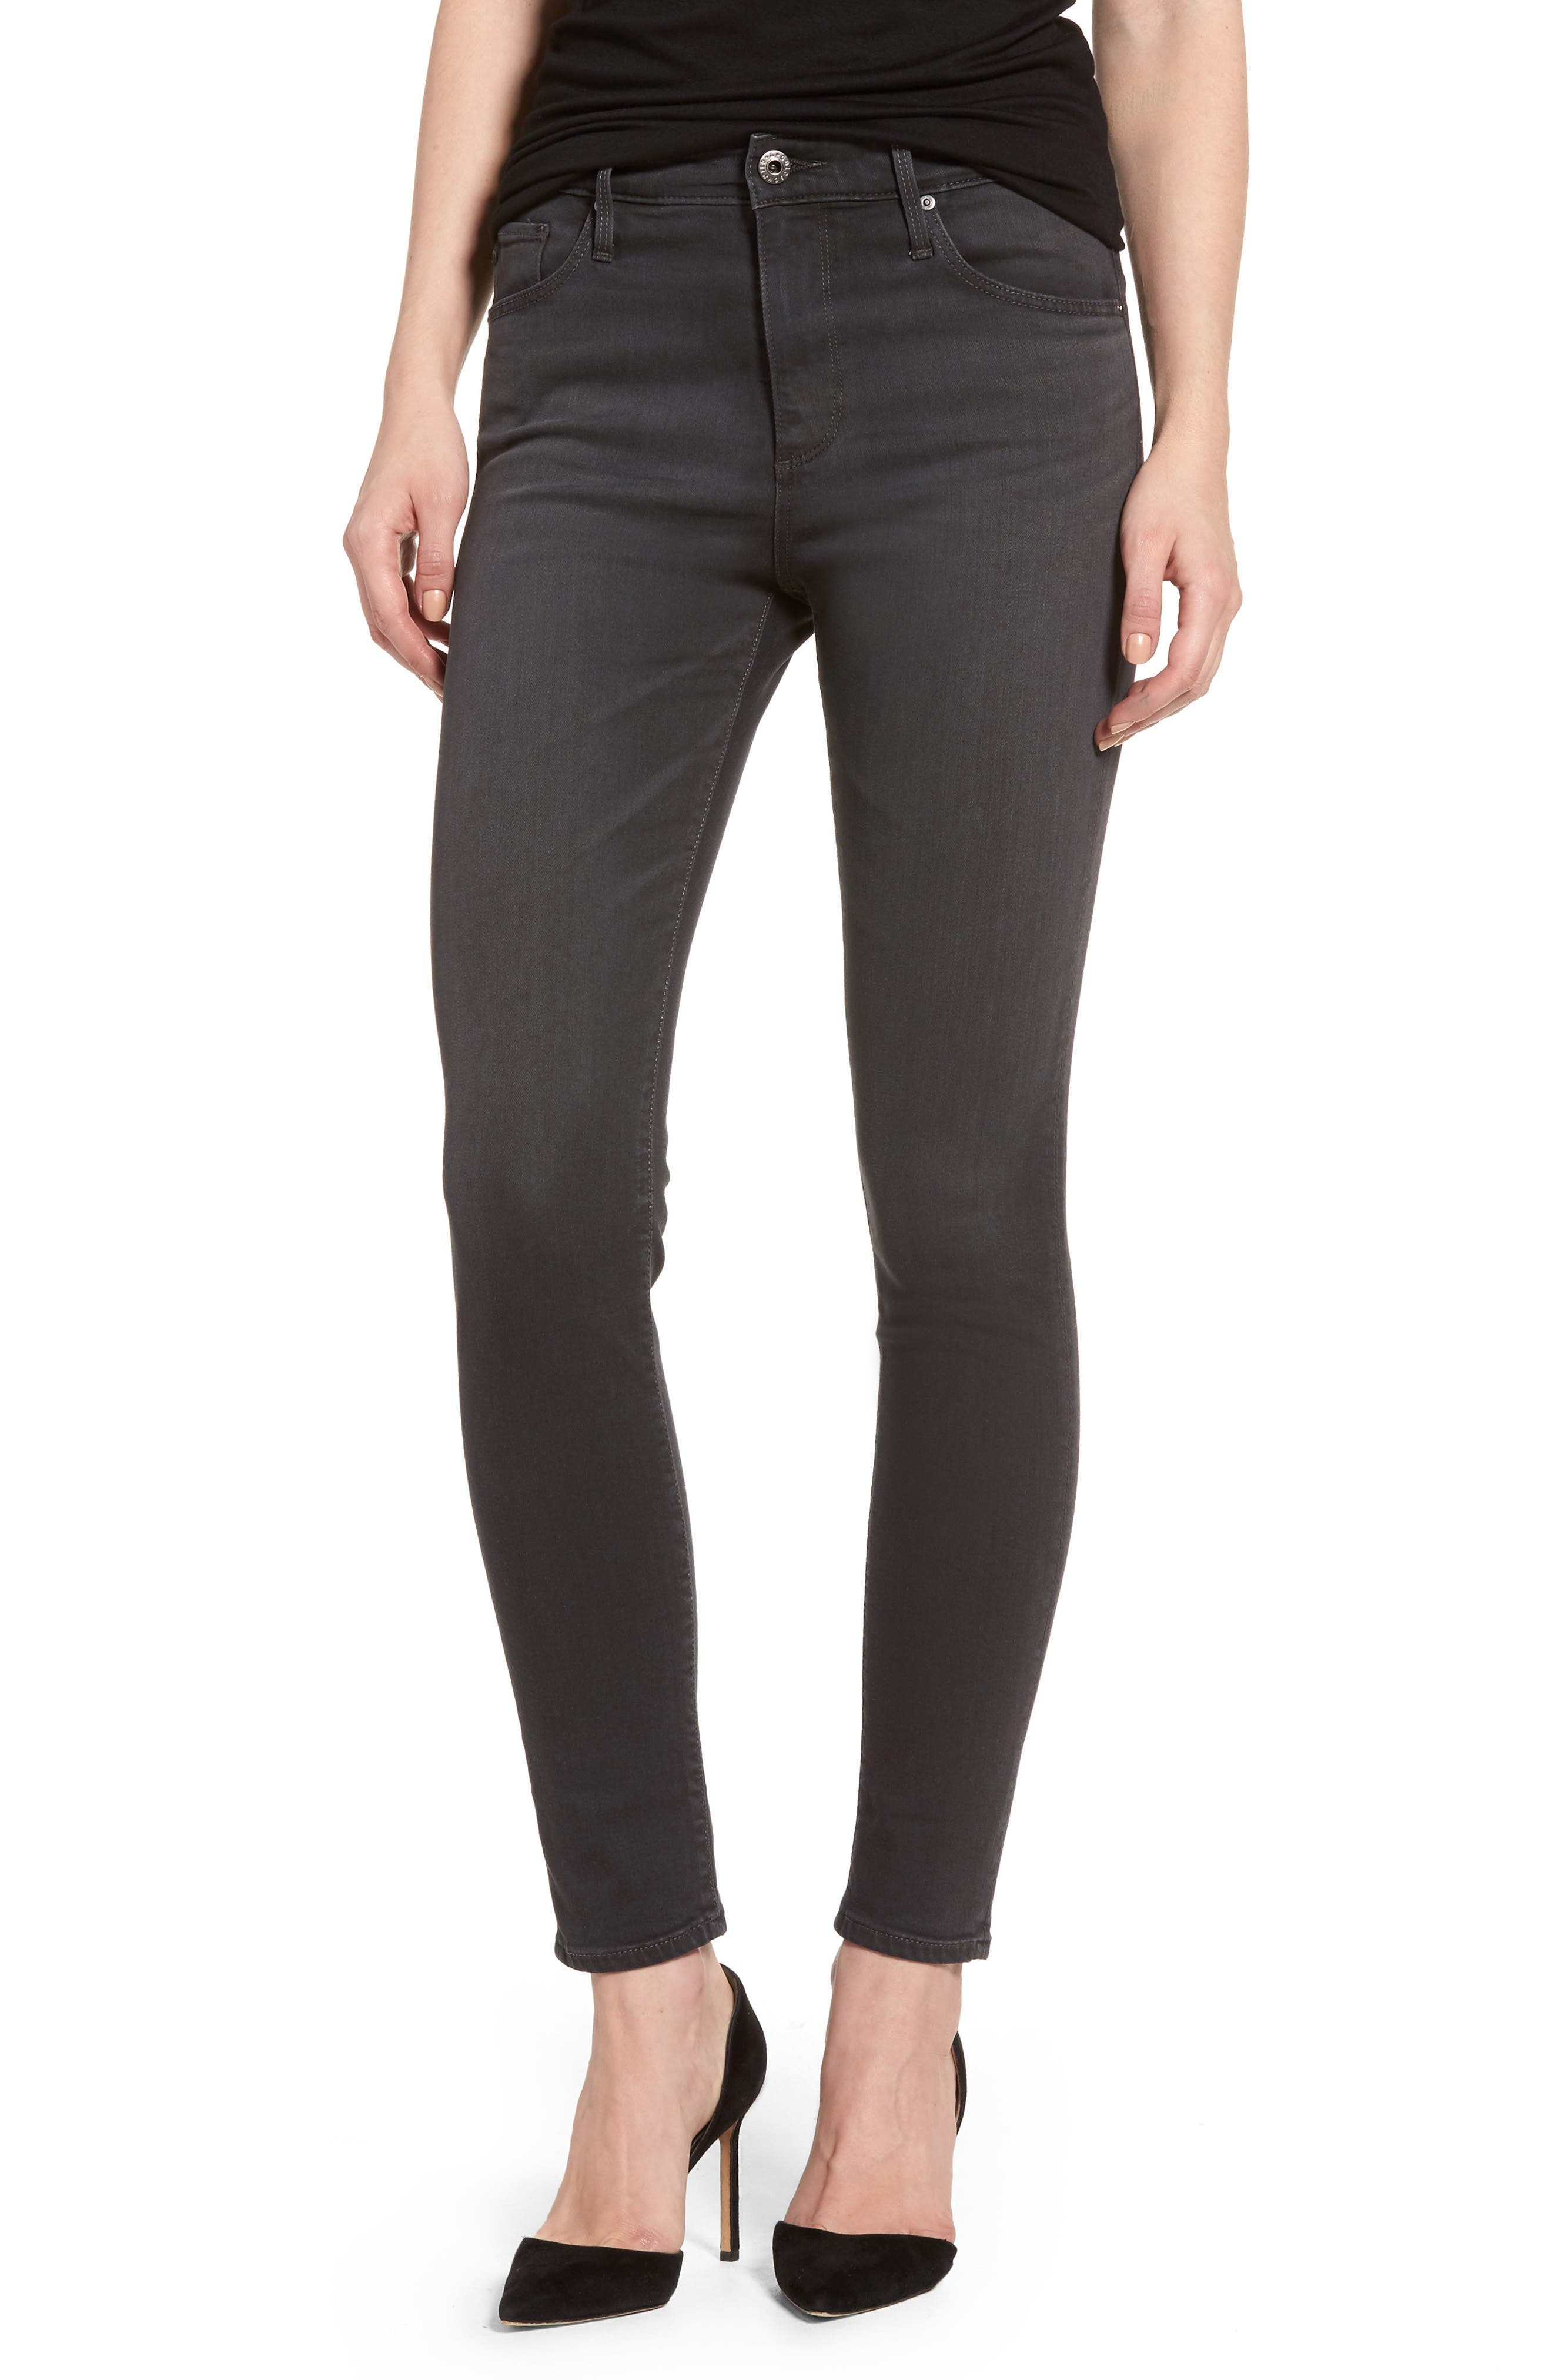 Alternate Image 1 Selected - AG Farrah High Waist Ankle Skinny Jeans (Grey Mist)